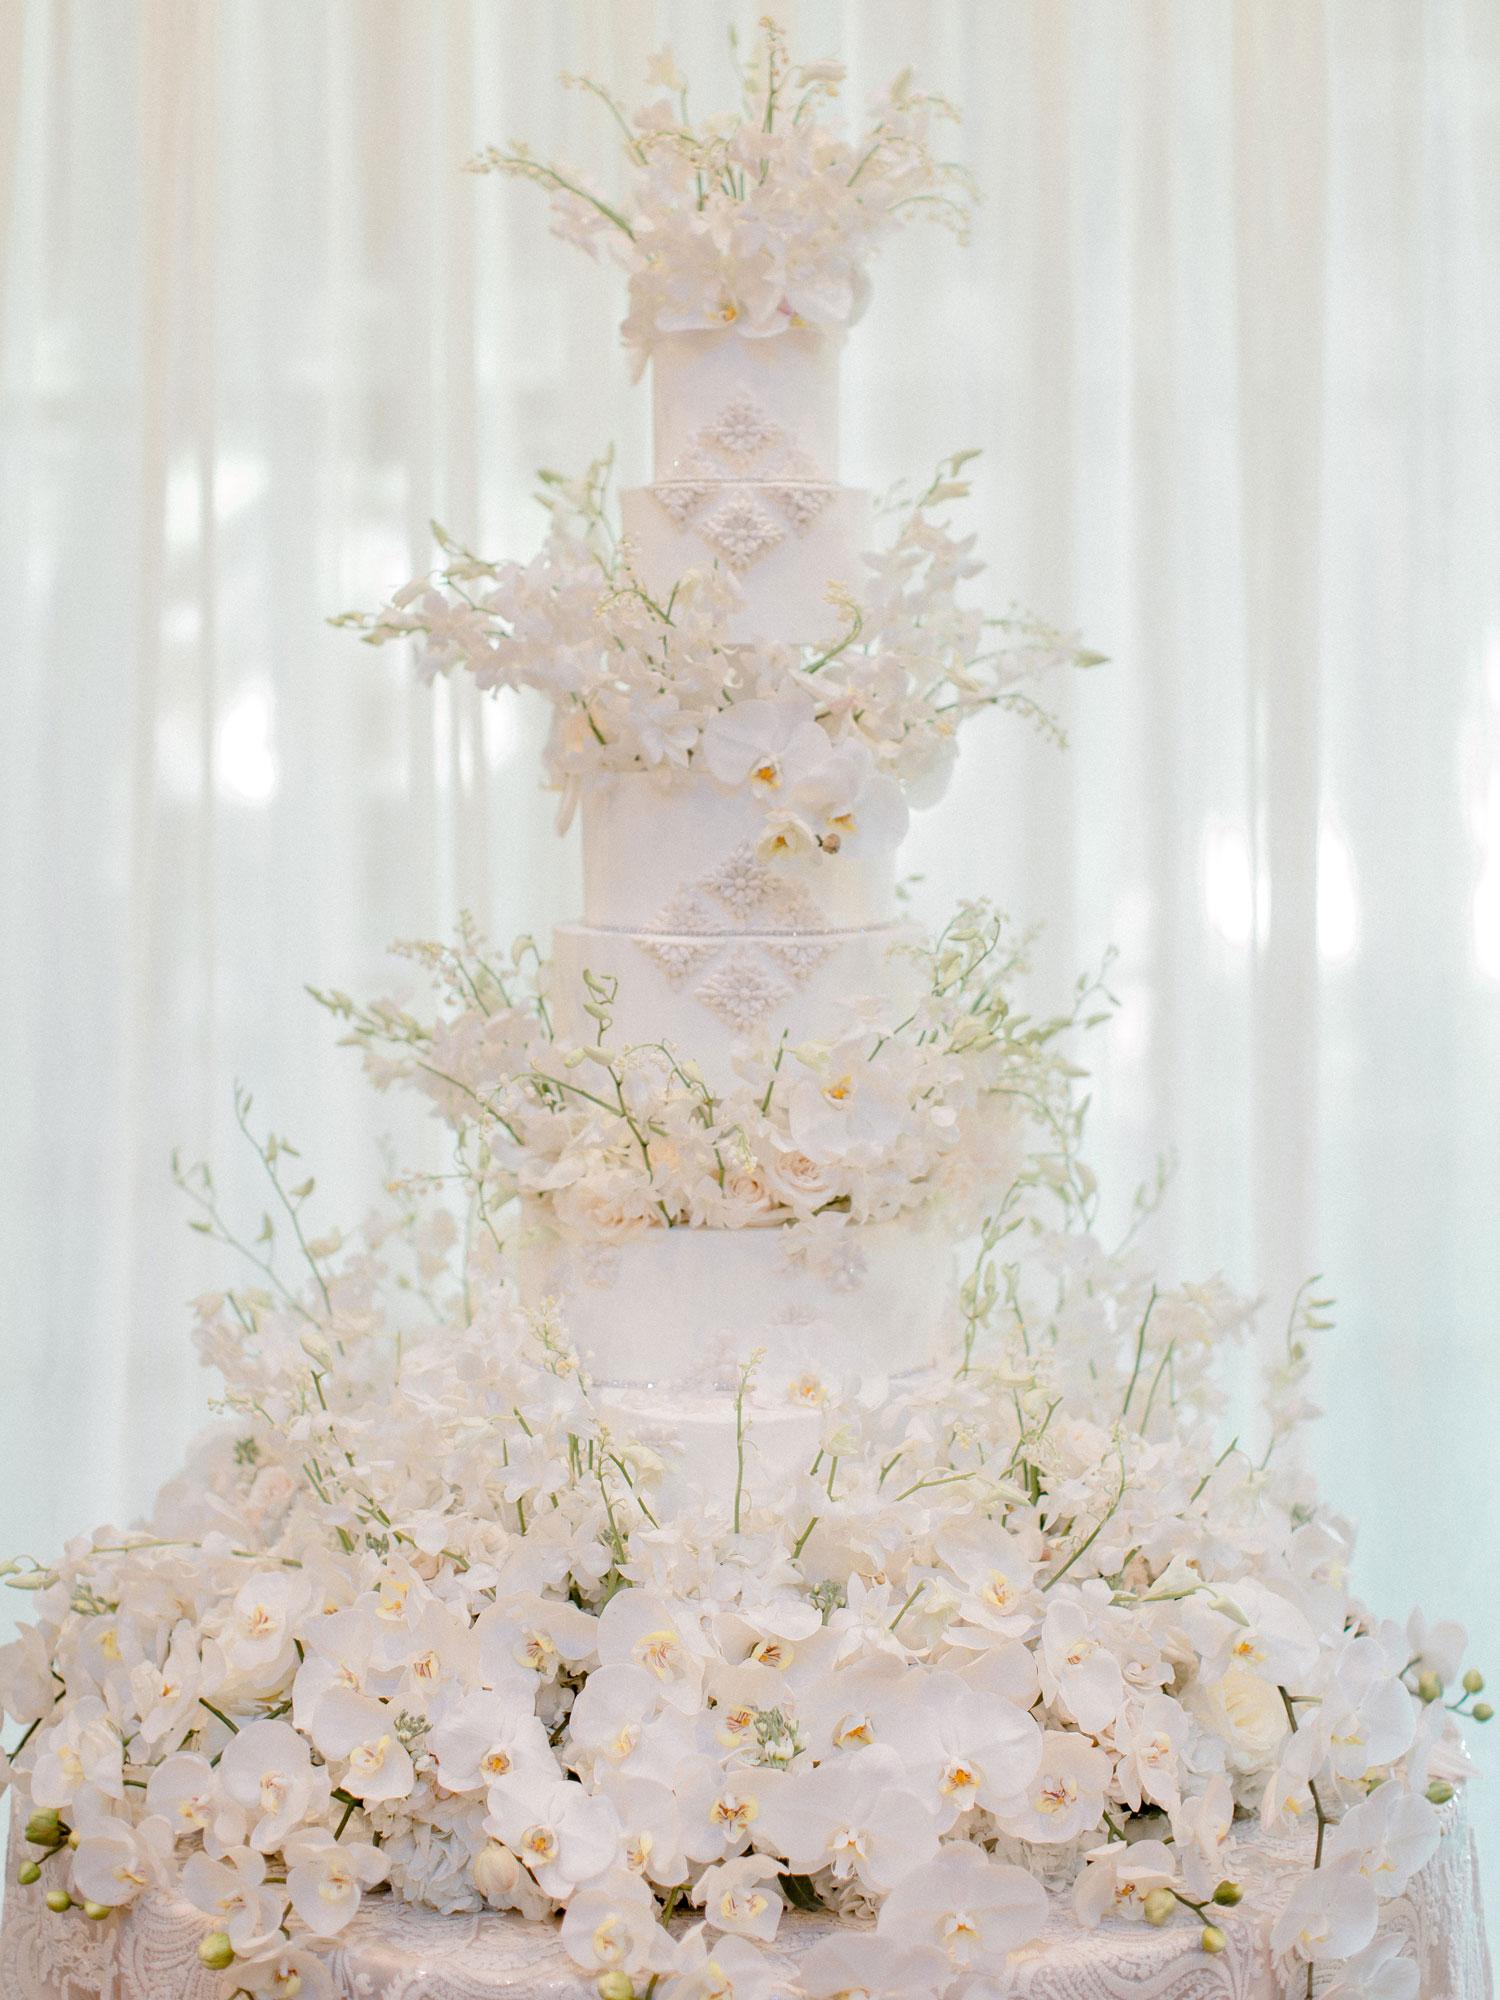 Opulent white wedding cake ideas with hundreds of sugar flowers